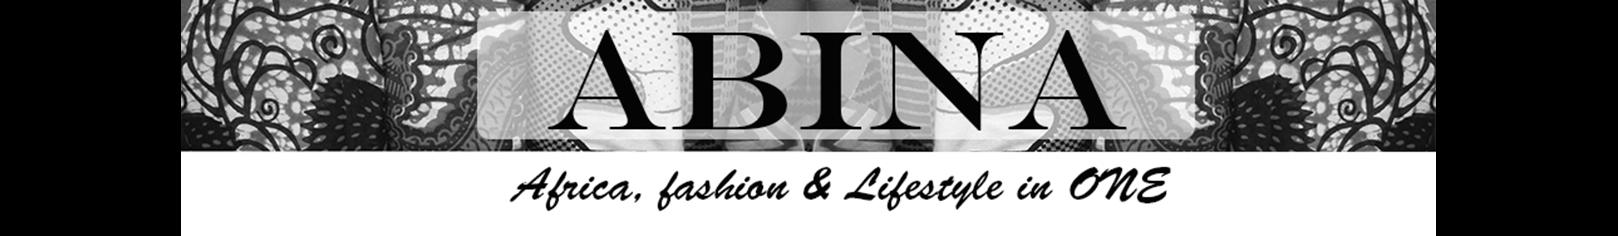 Abina_logo-grey